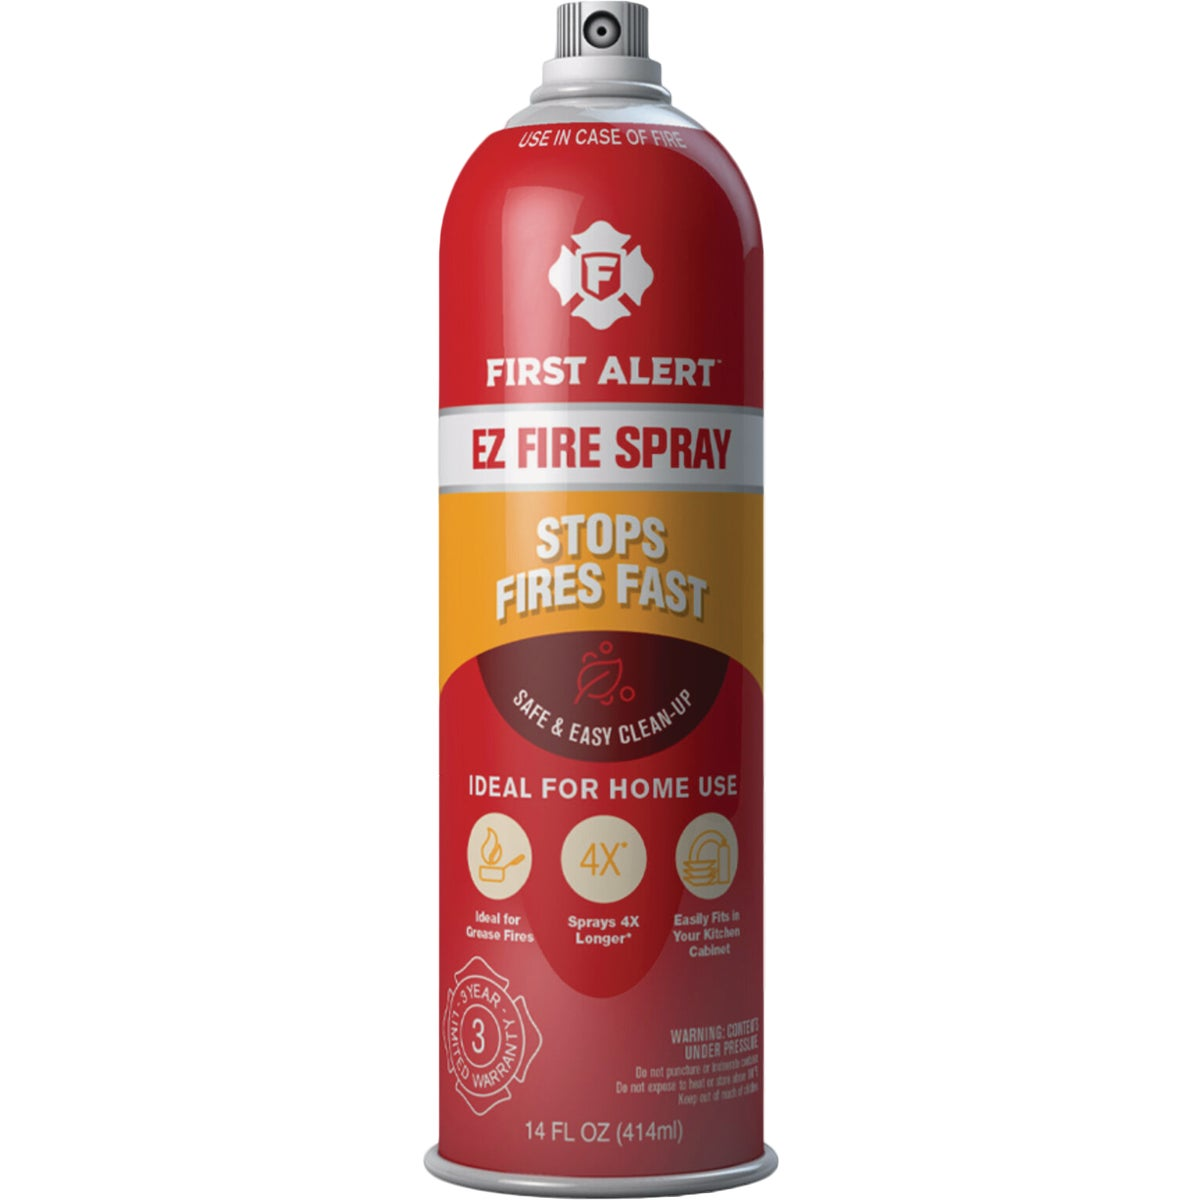 SPRAY FIRE SUPPRESSANT - AF400 by First Alert  Jarden